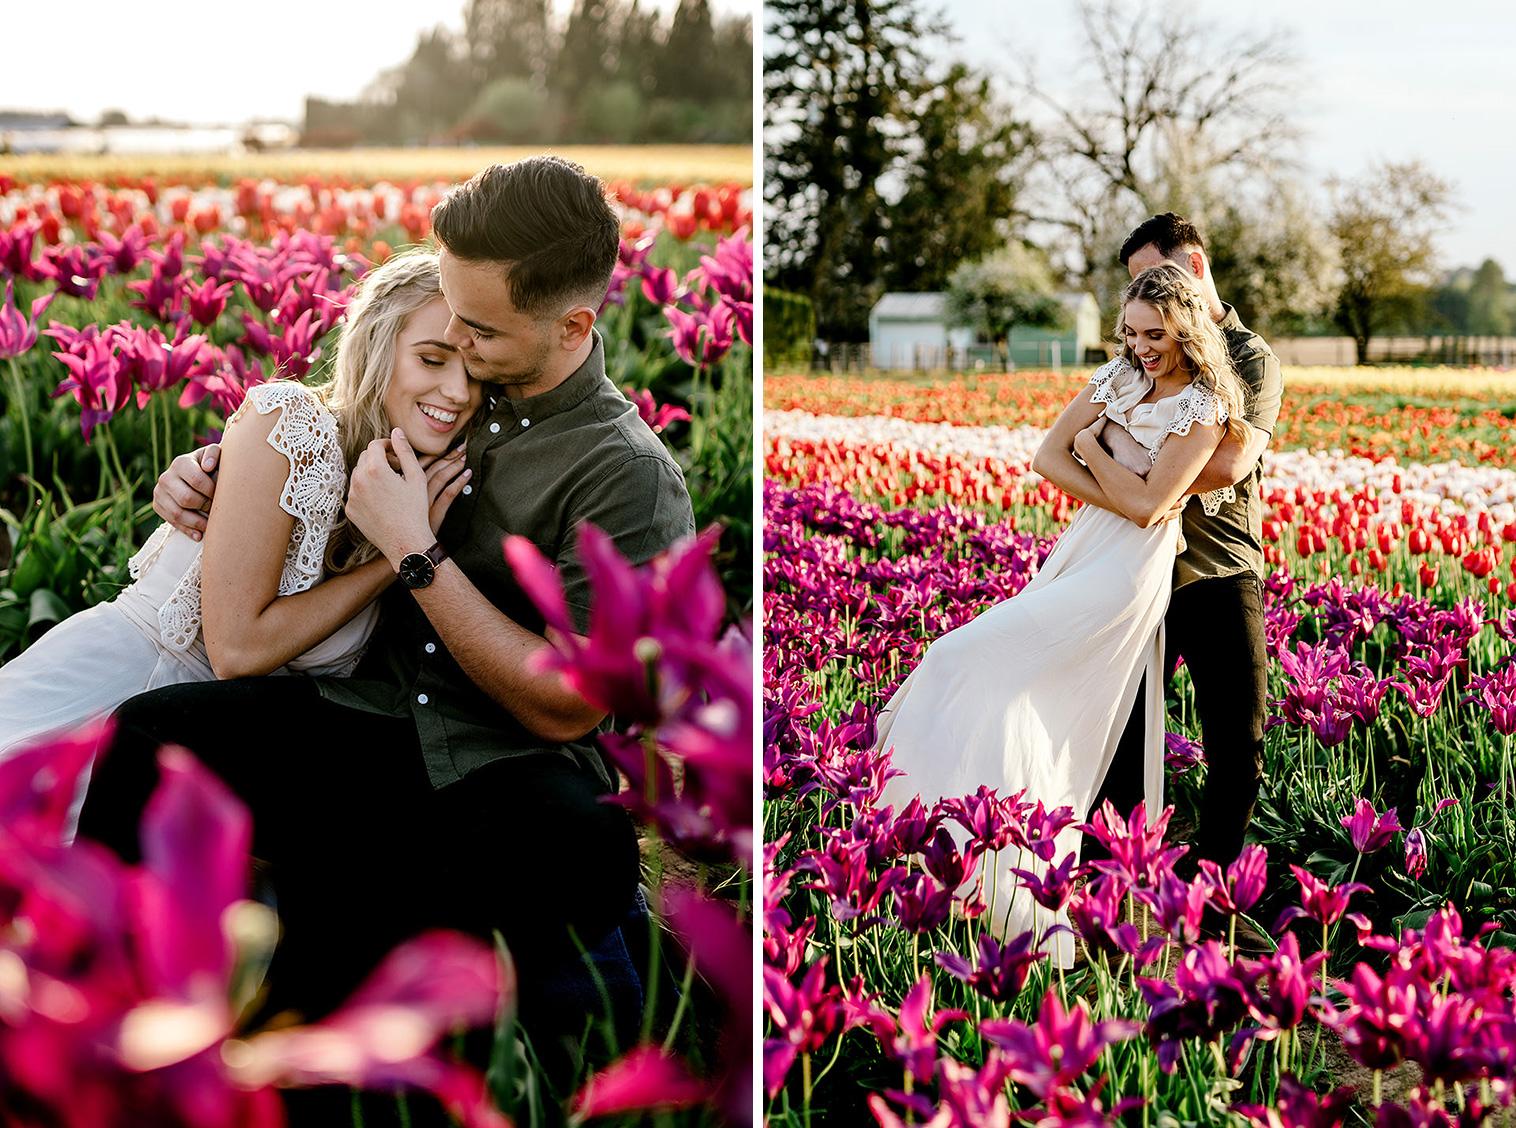 Tulip-field-engagement-session-Portland-Photographer-16.jpg